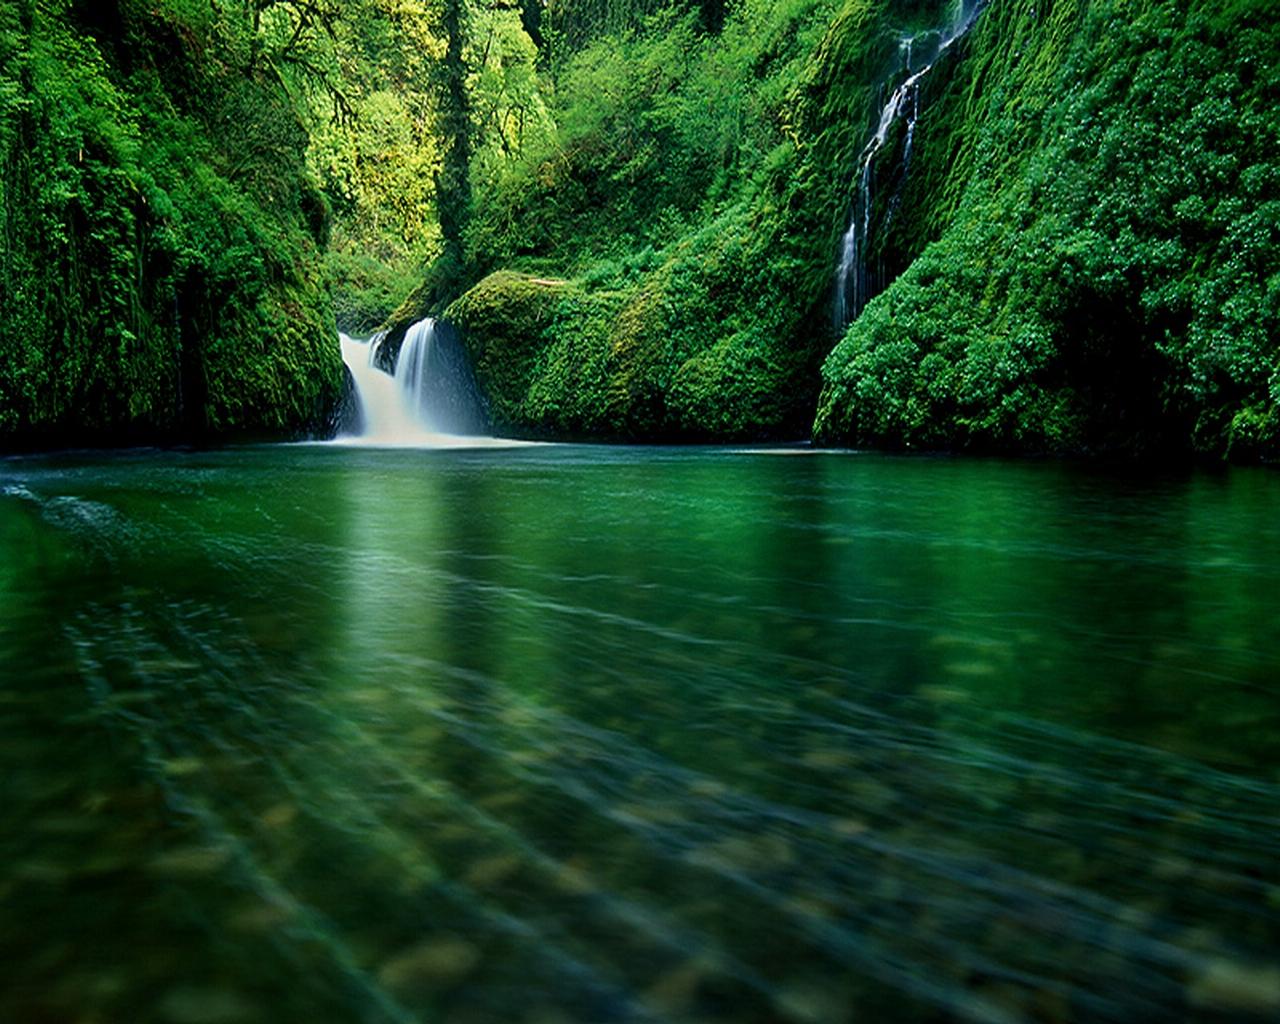 Eagle creek wilderness oregon desktop wallpaper - Oregon nature wallpaper ...